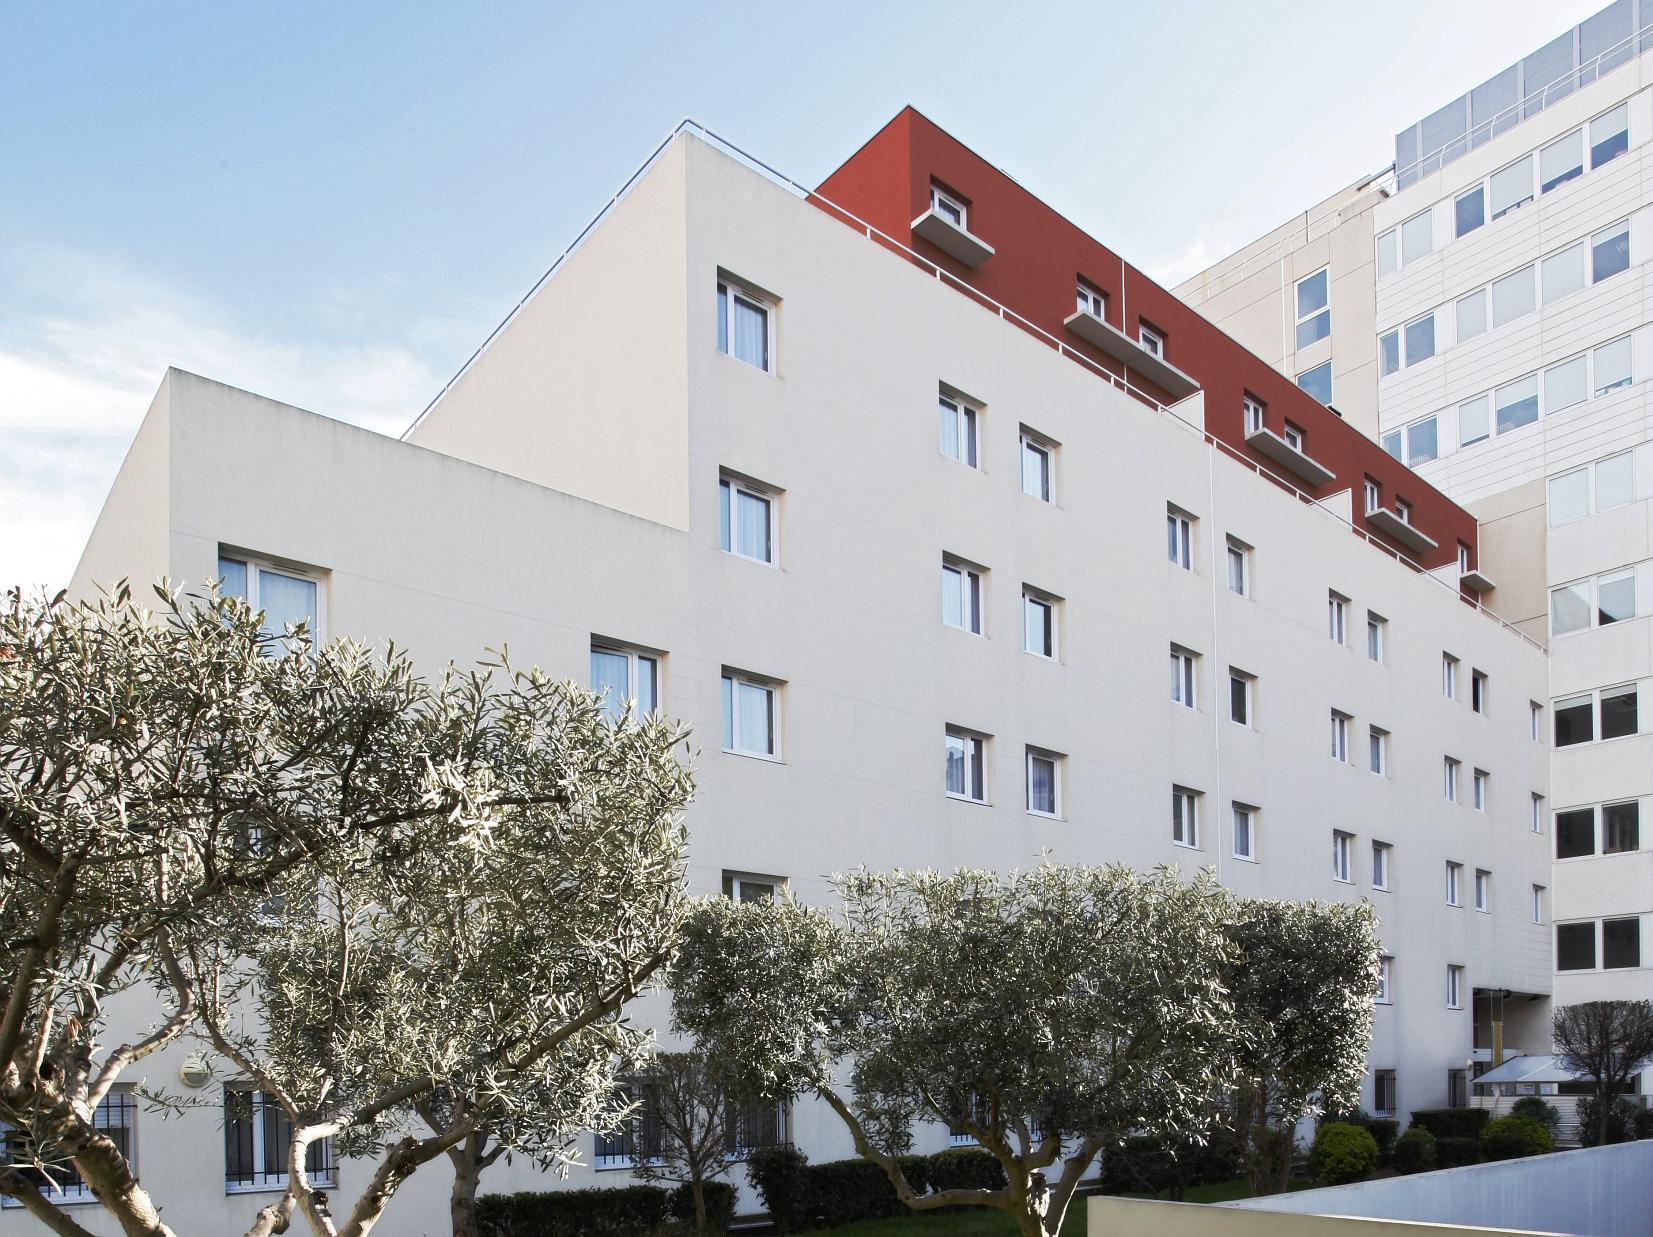 Aparthotel Adagio Access Marseille Prado Perier, Bouches-du-Rhône